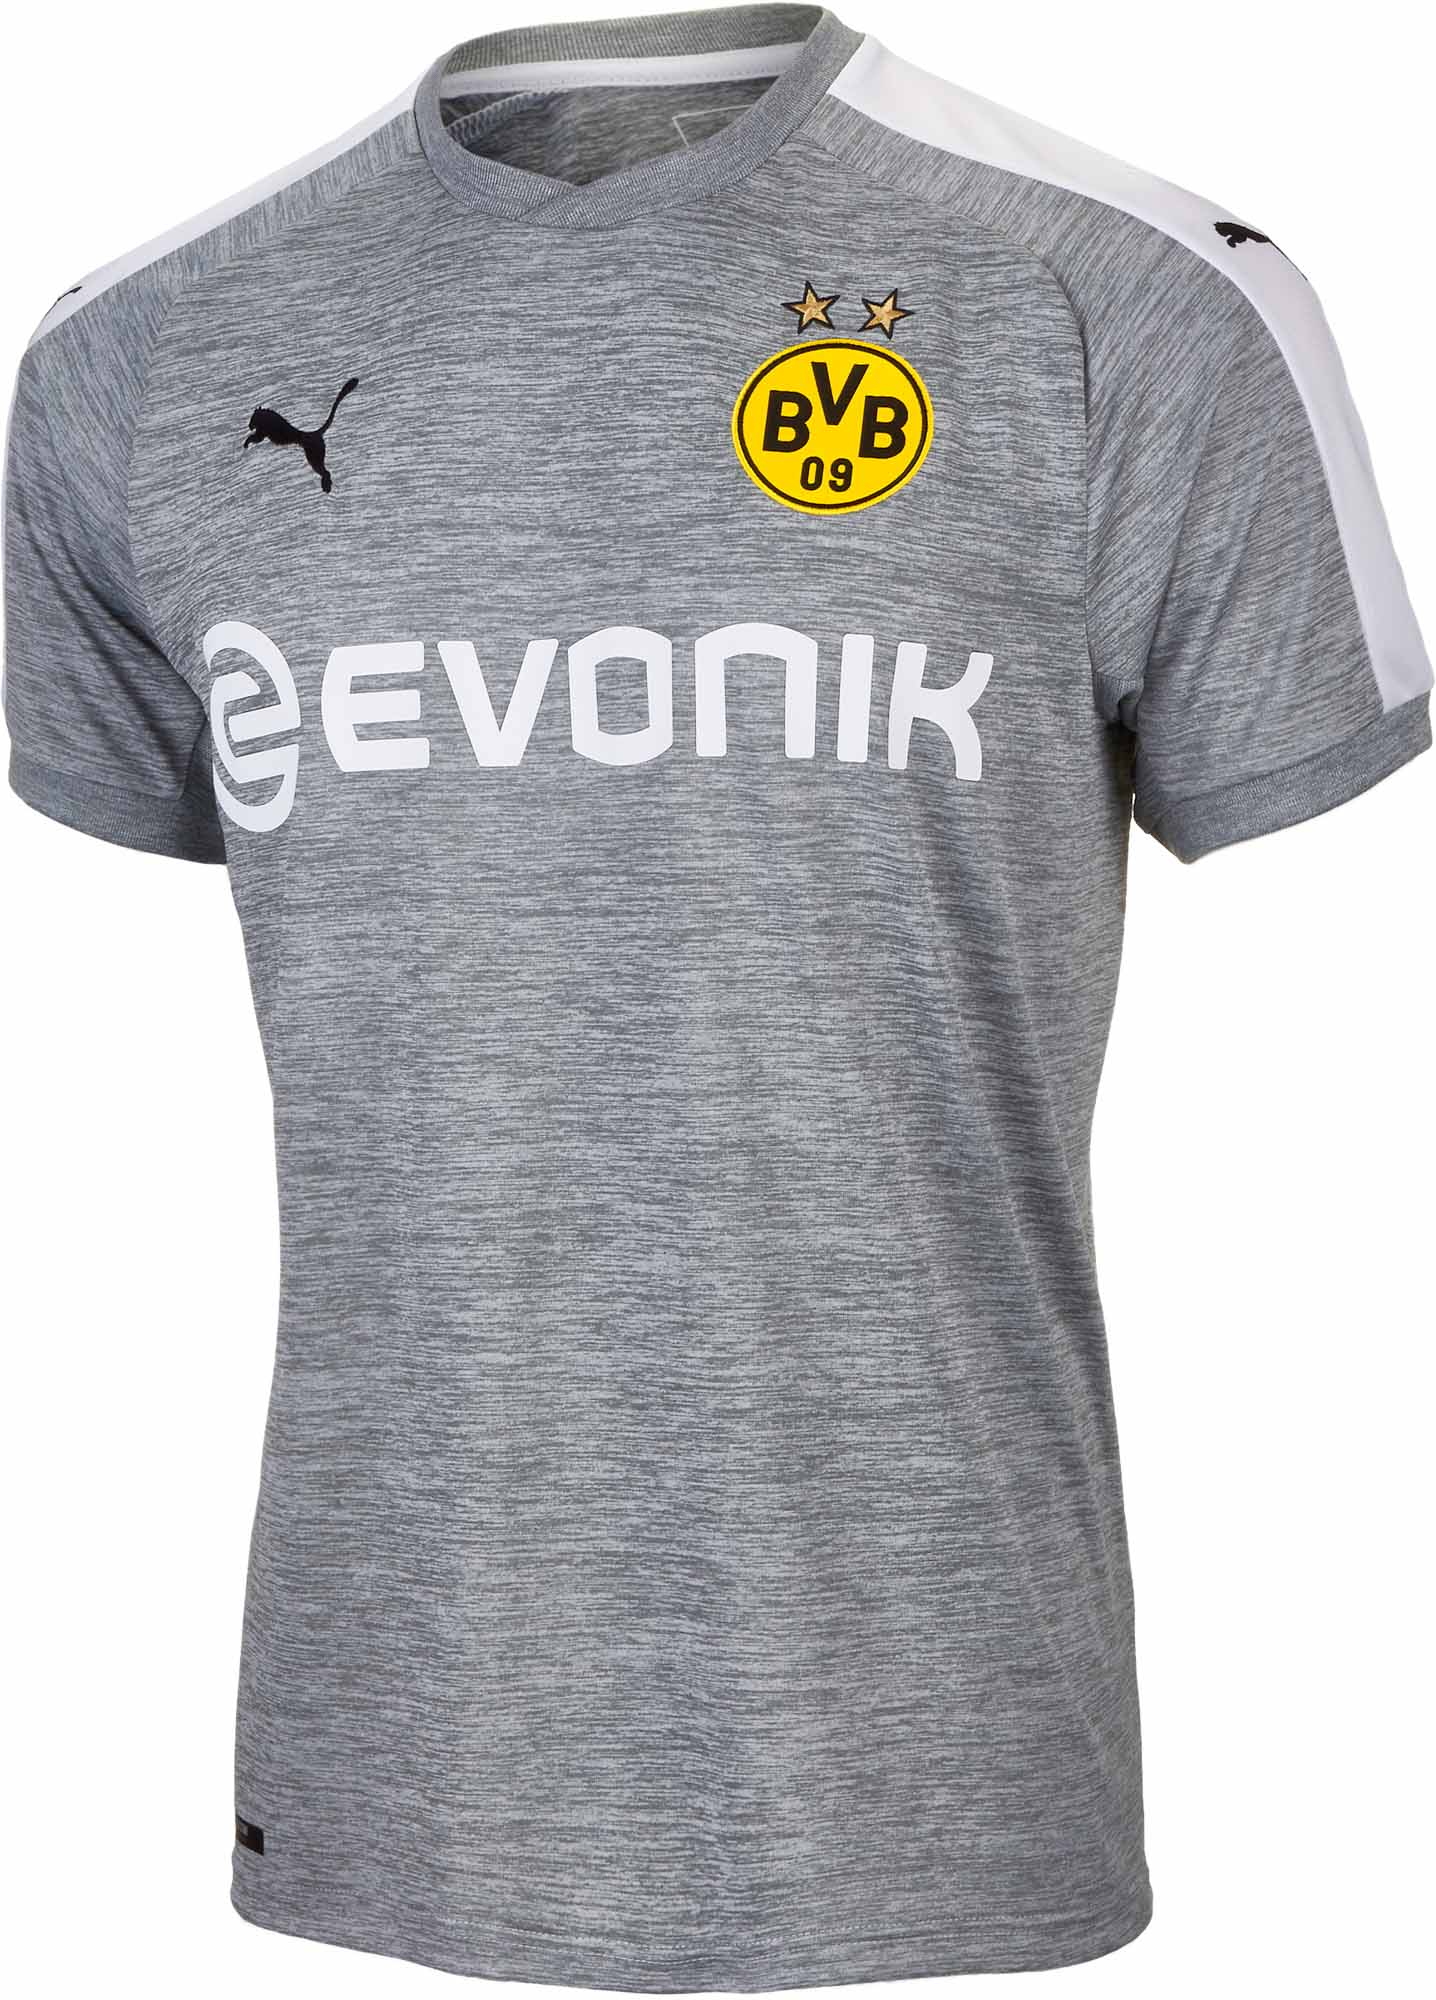 new style d7b48 7c9c7 201718 Puma Borussia Dortmund 3rd Jersey